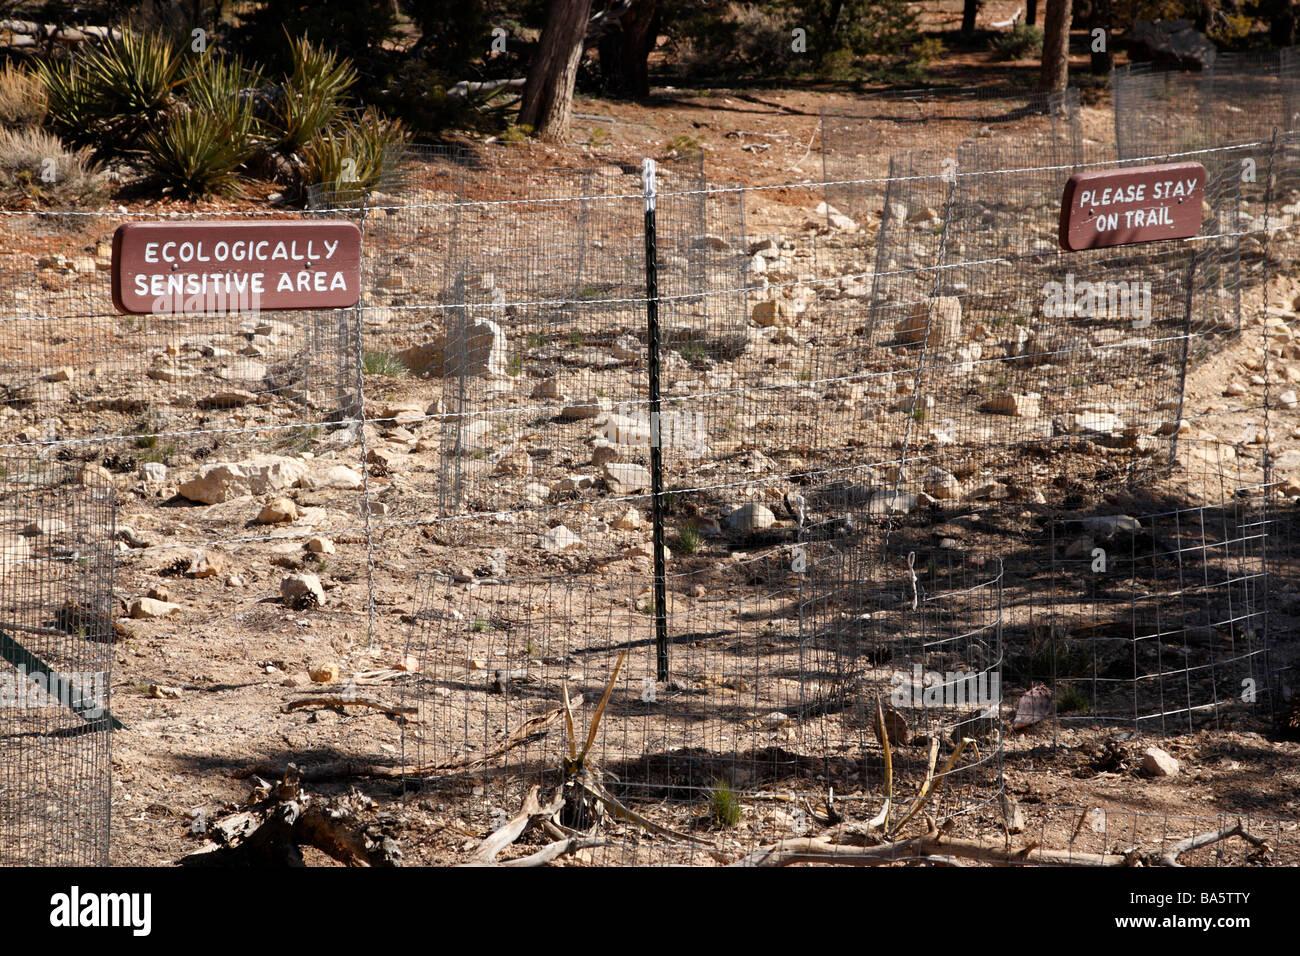 fenced off ecologically sensitive area at maricopa point grand canyon national park arizona usa - Stock Image